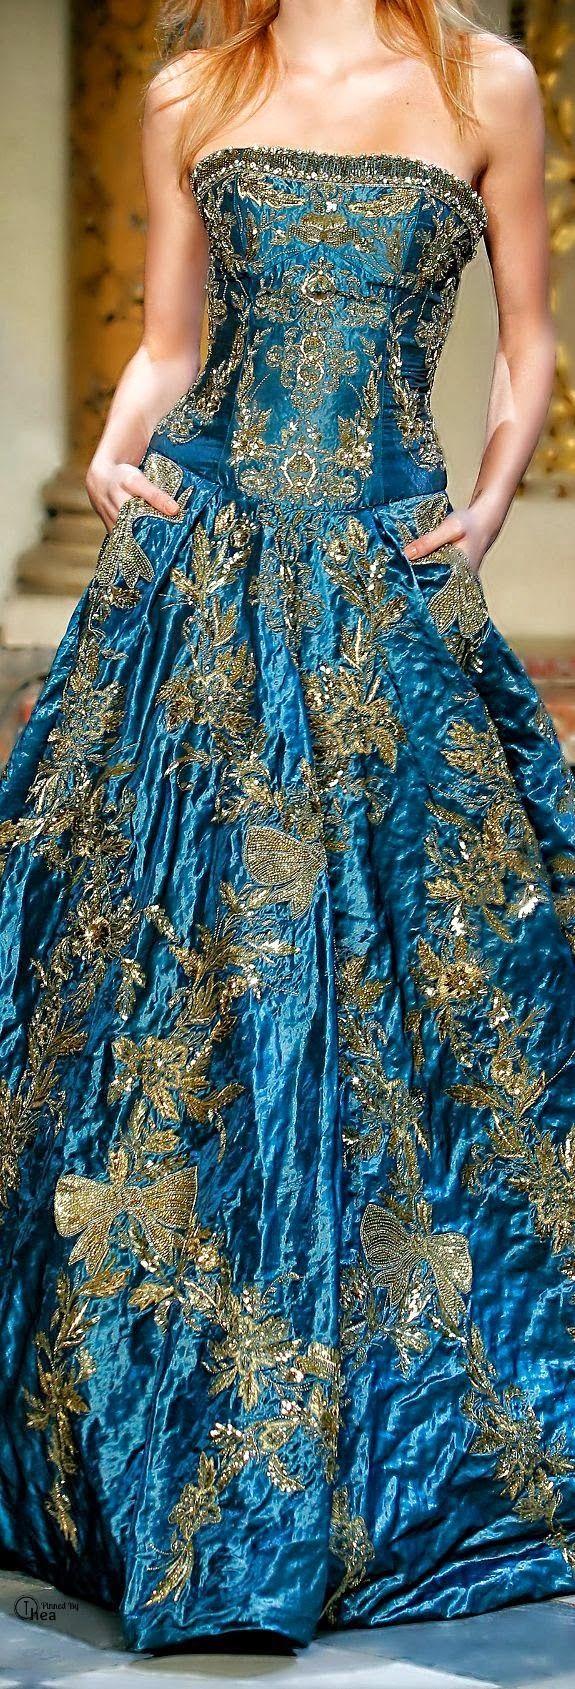 Zuhair Murad-Designs blue and gold evening gown